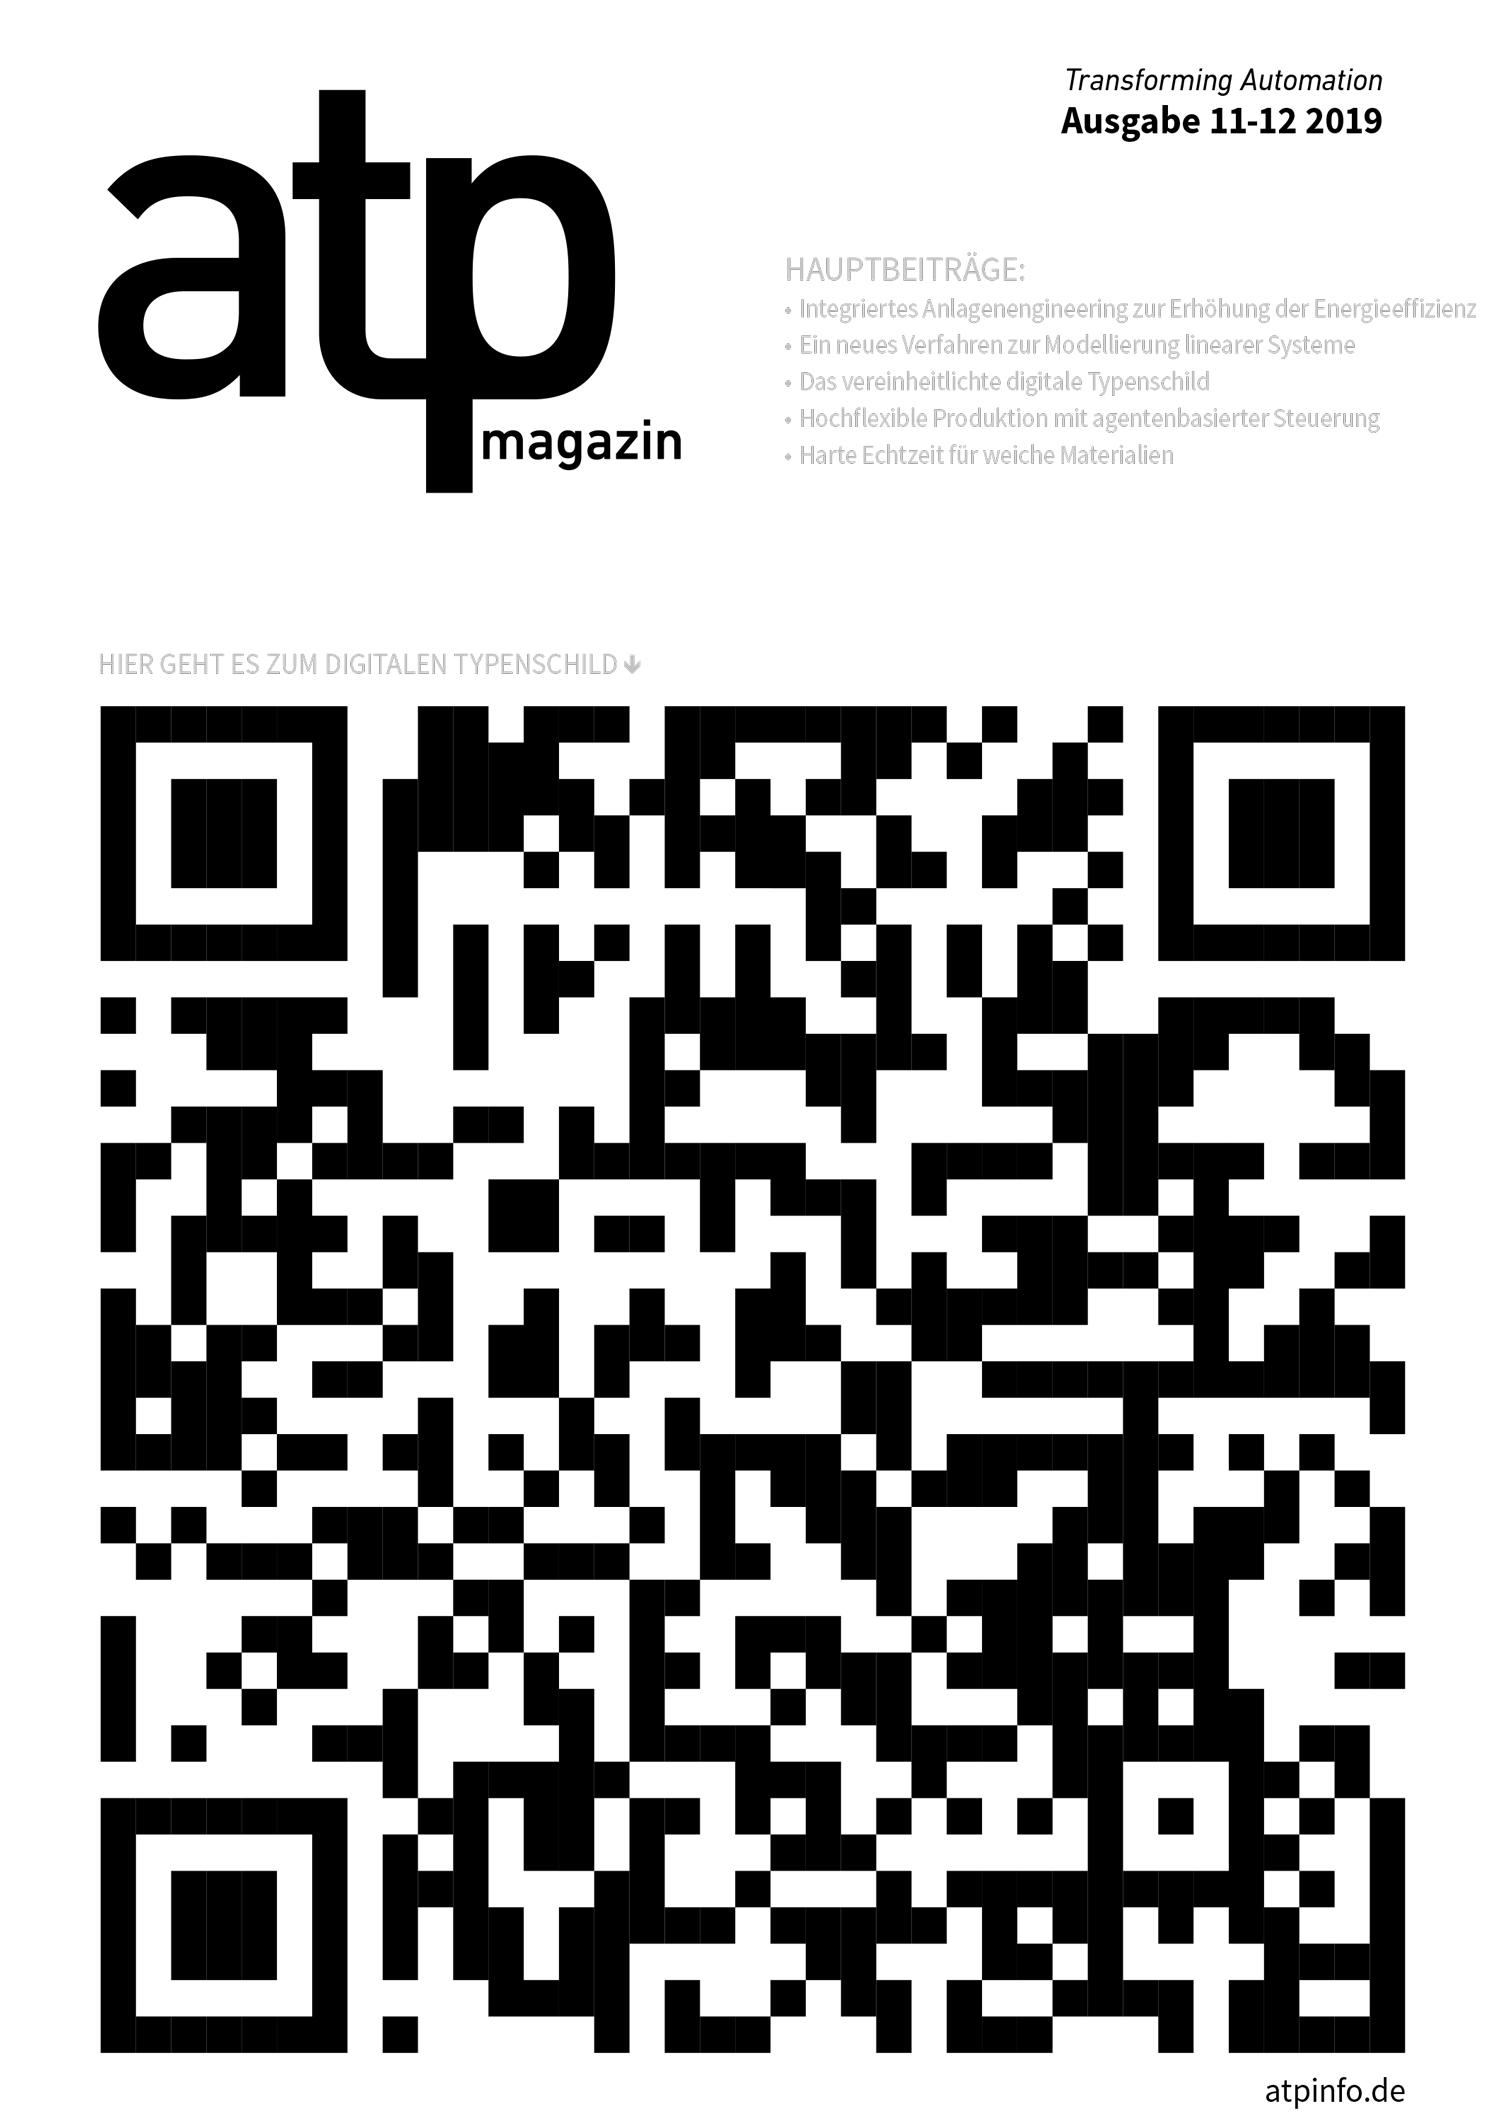 atp magazin 11-12/2019